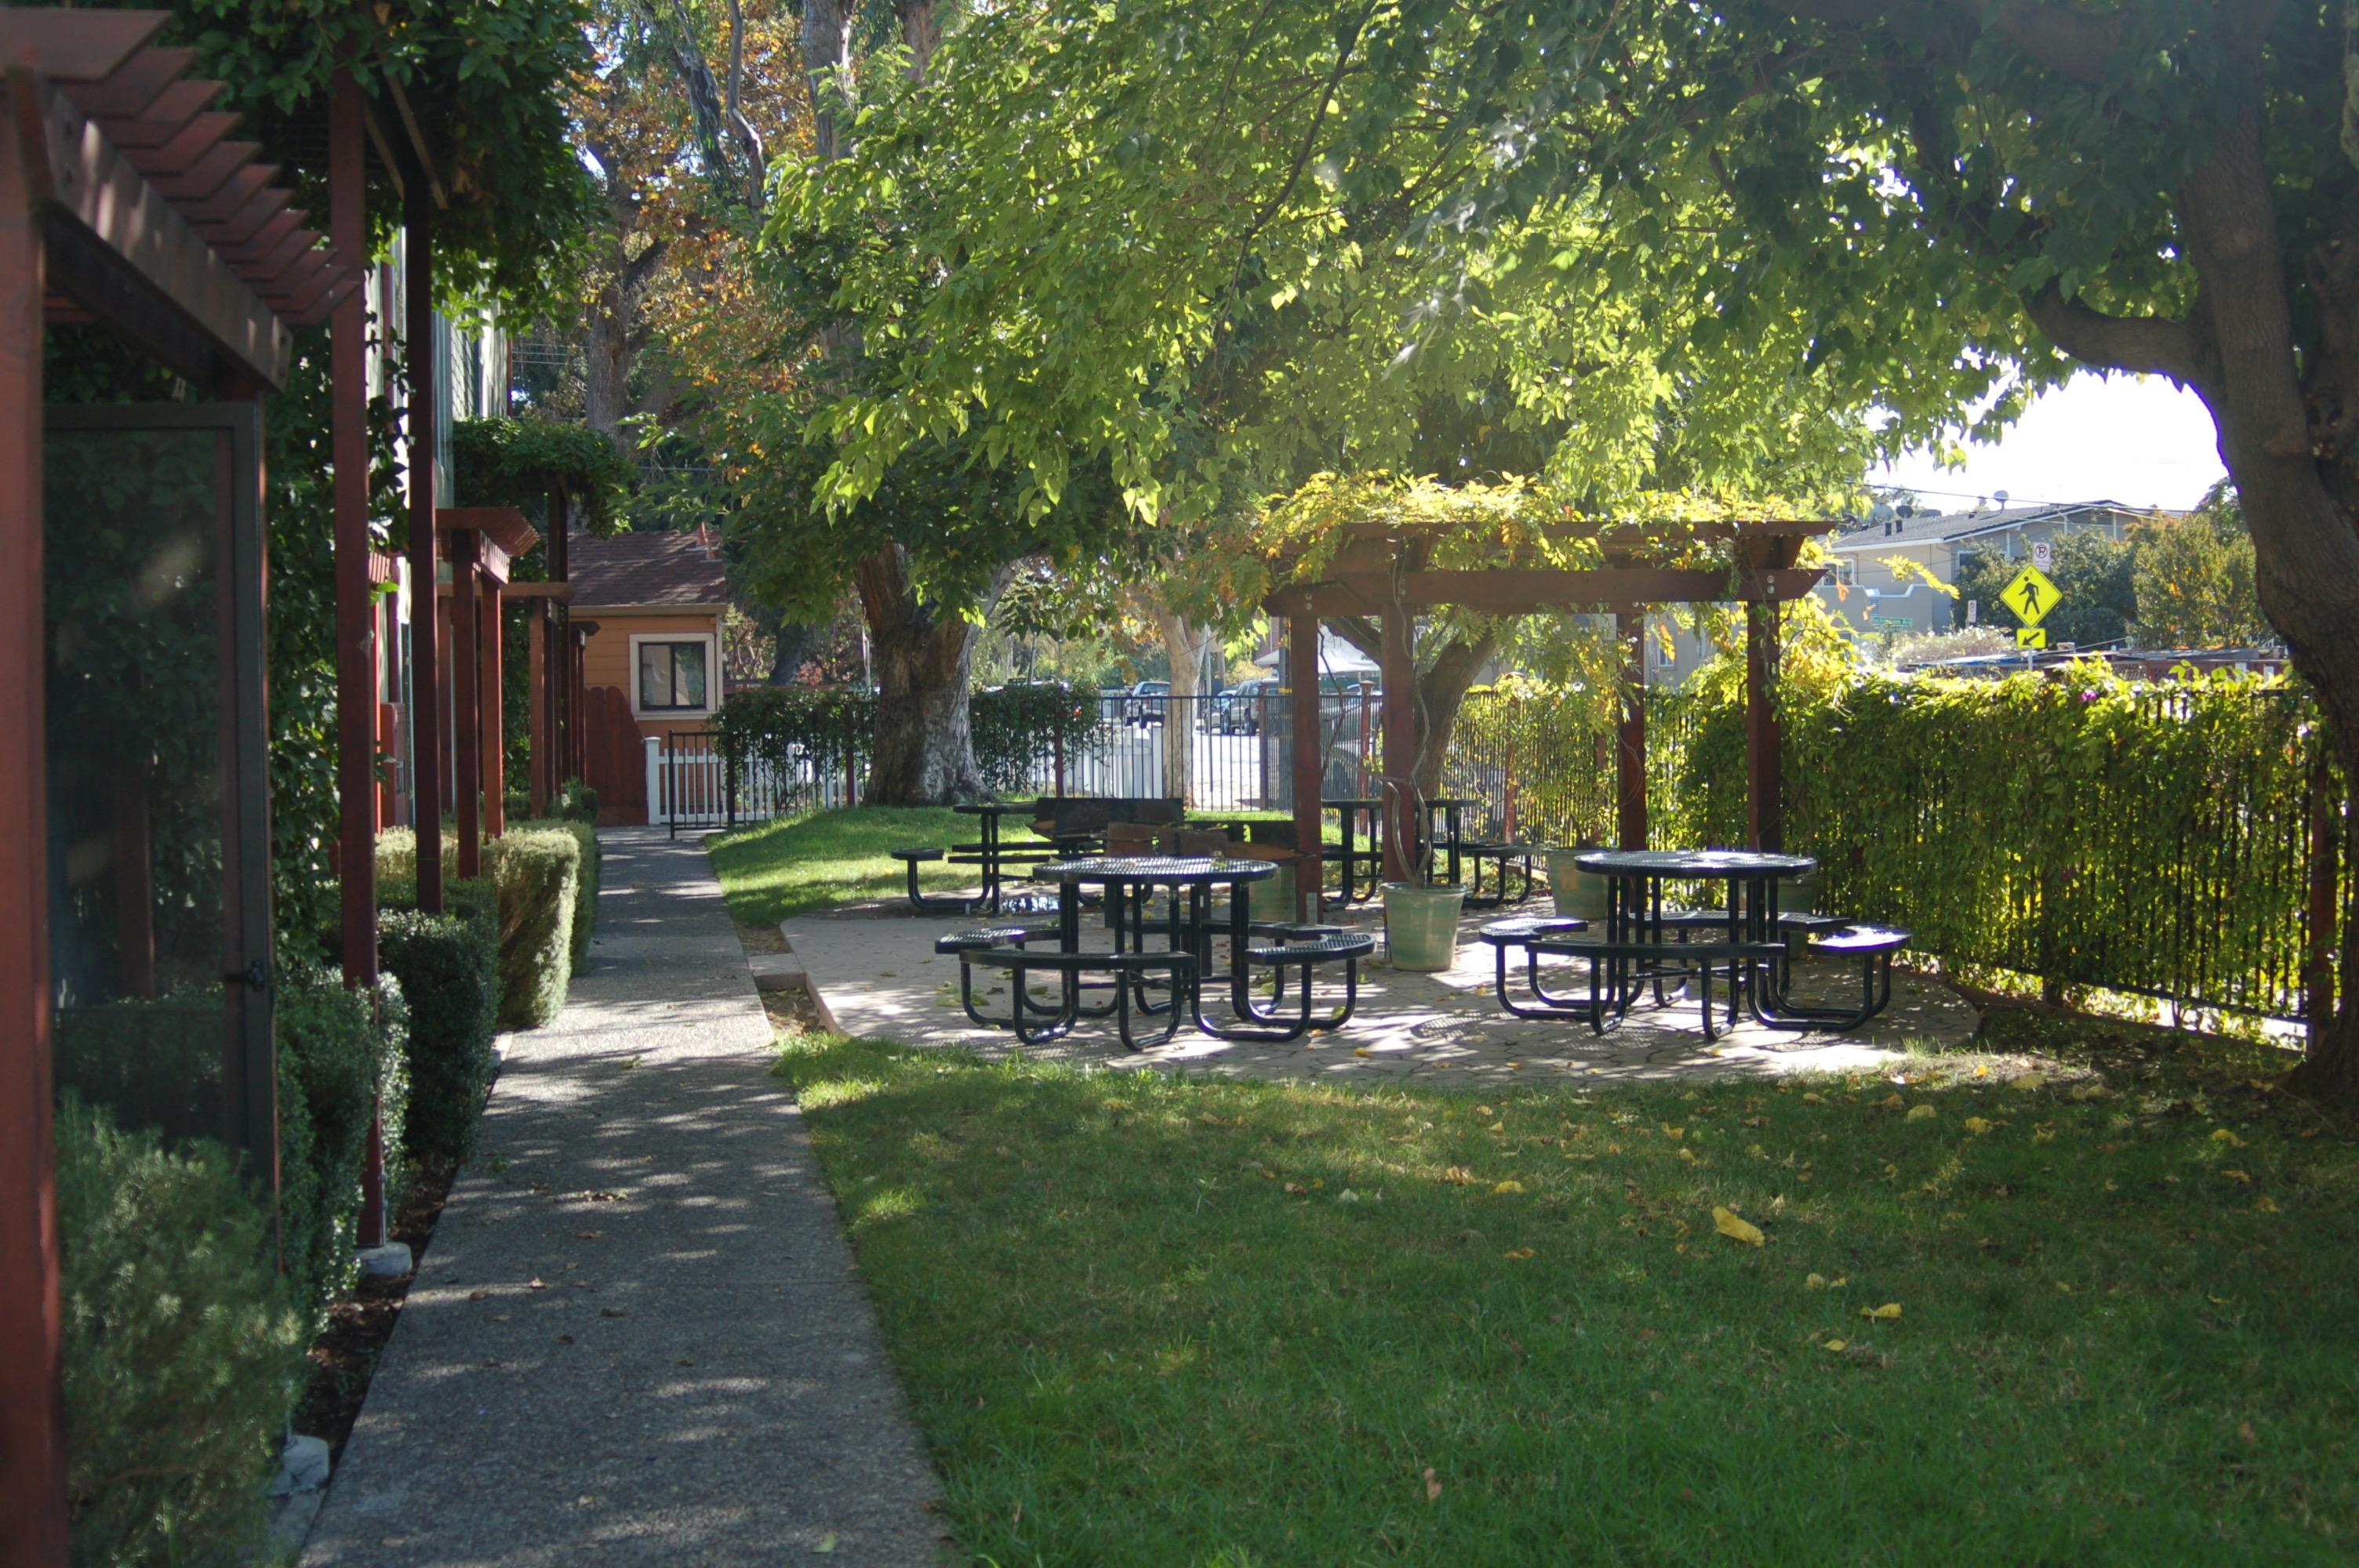 st-clares-apartments-patio-st-francis-center